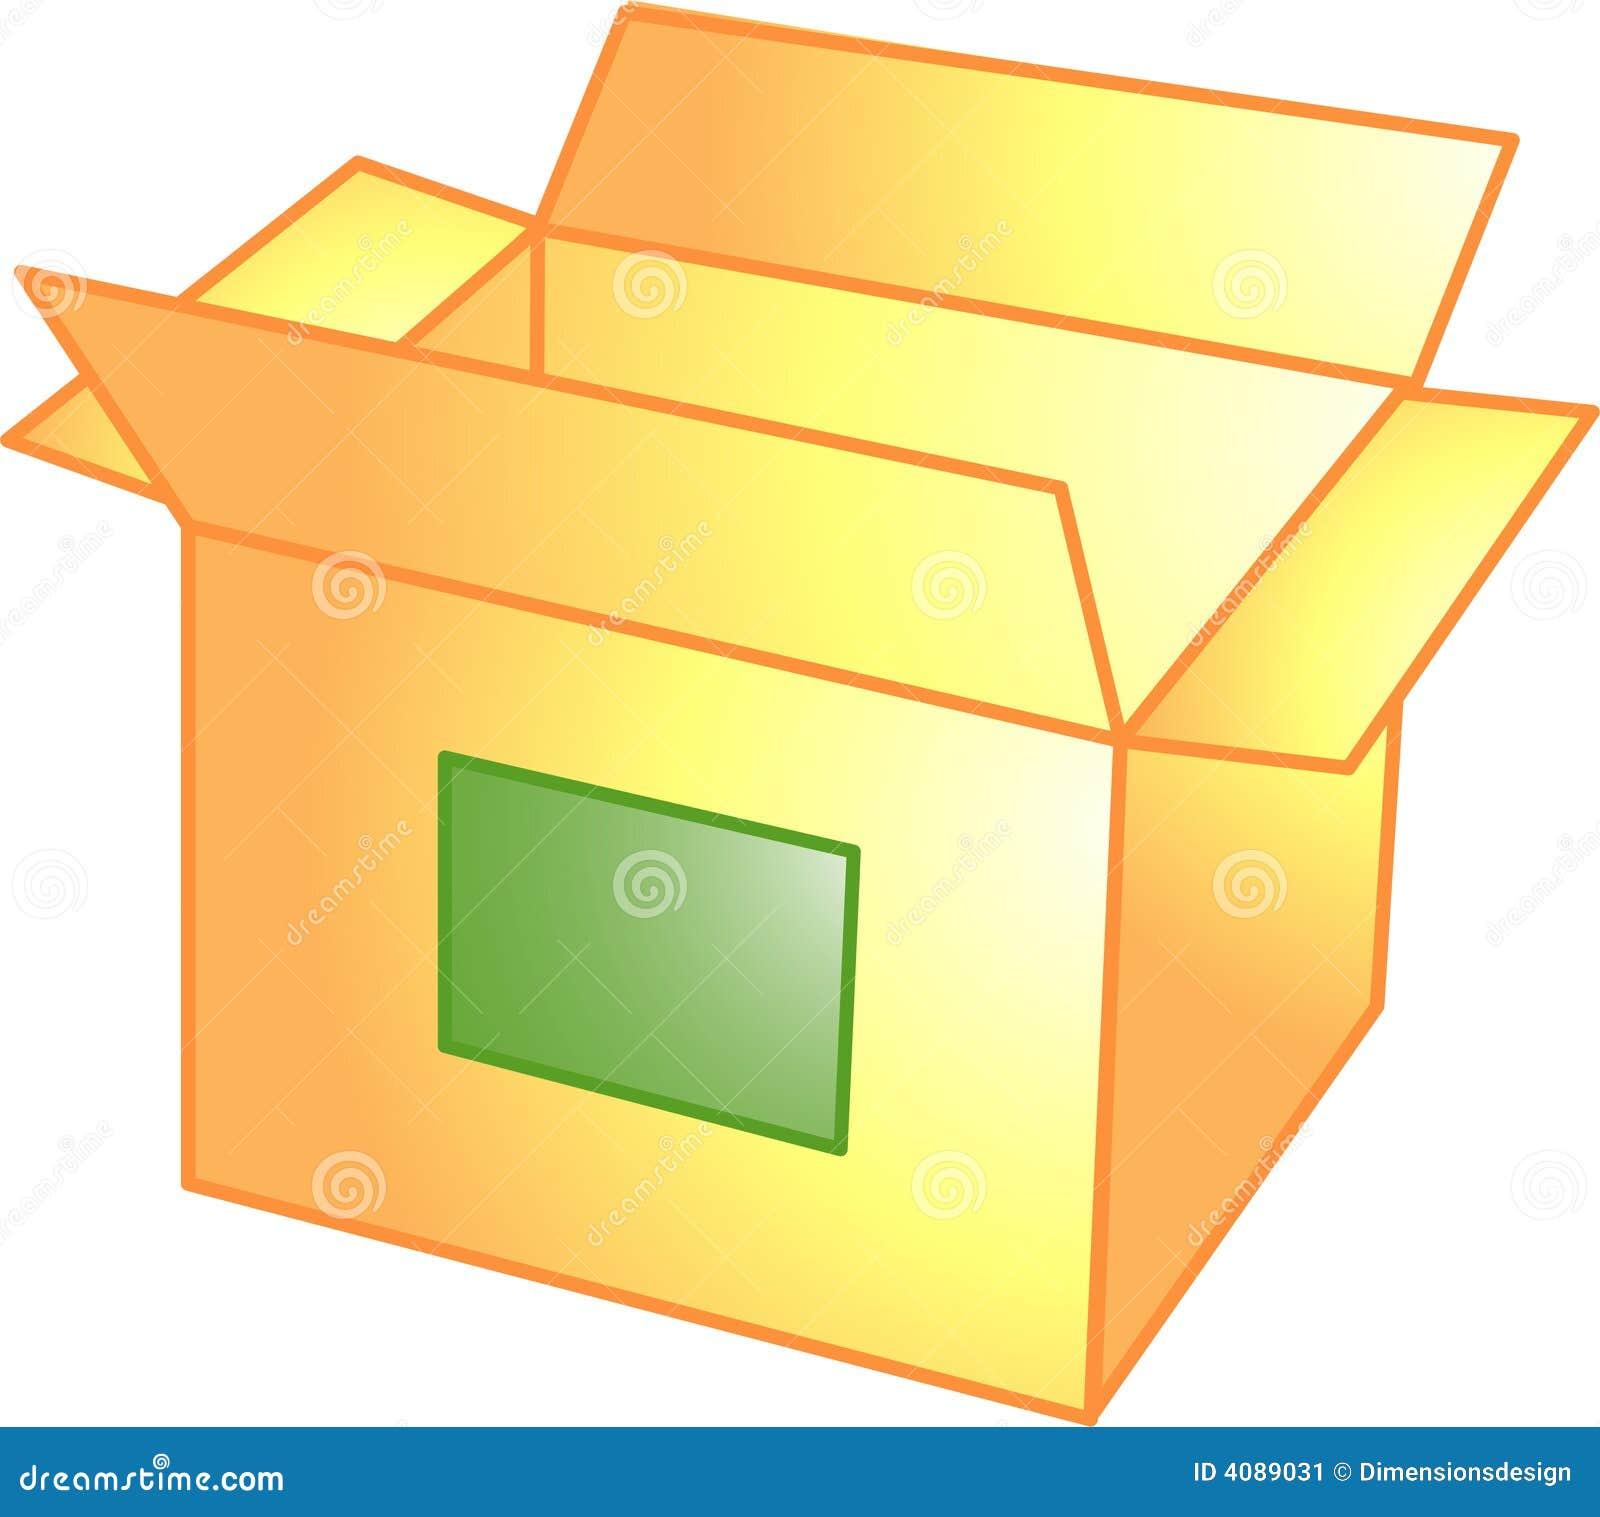 Open Box Icon Or Symbol Stock Illustration Illustration Of Move